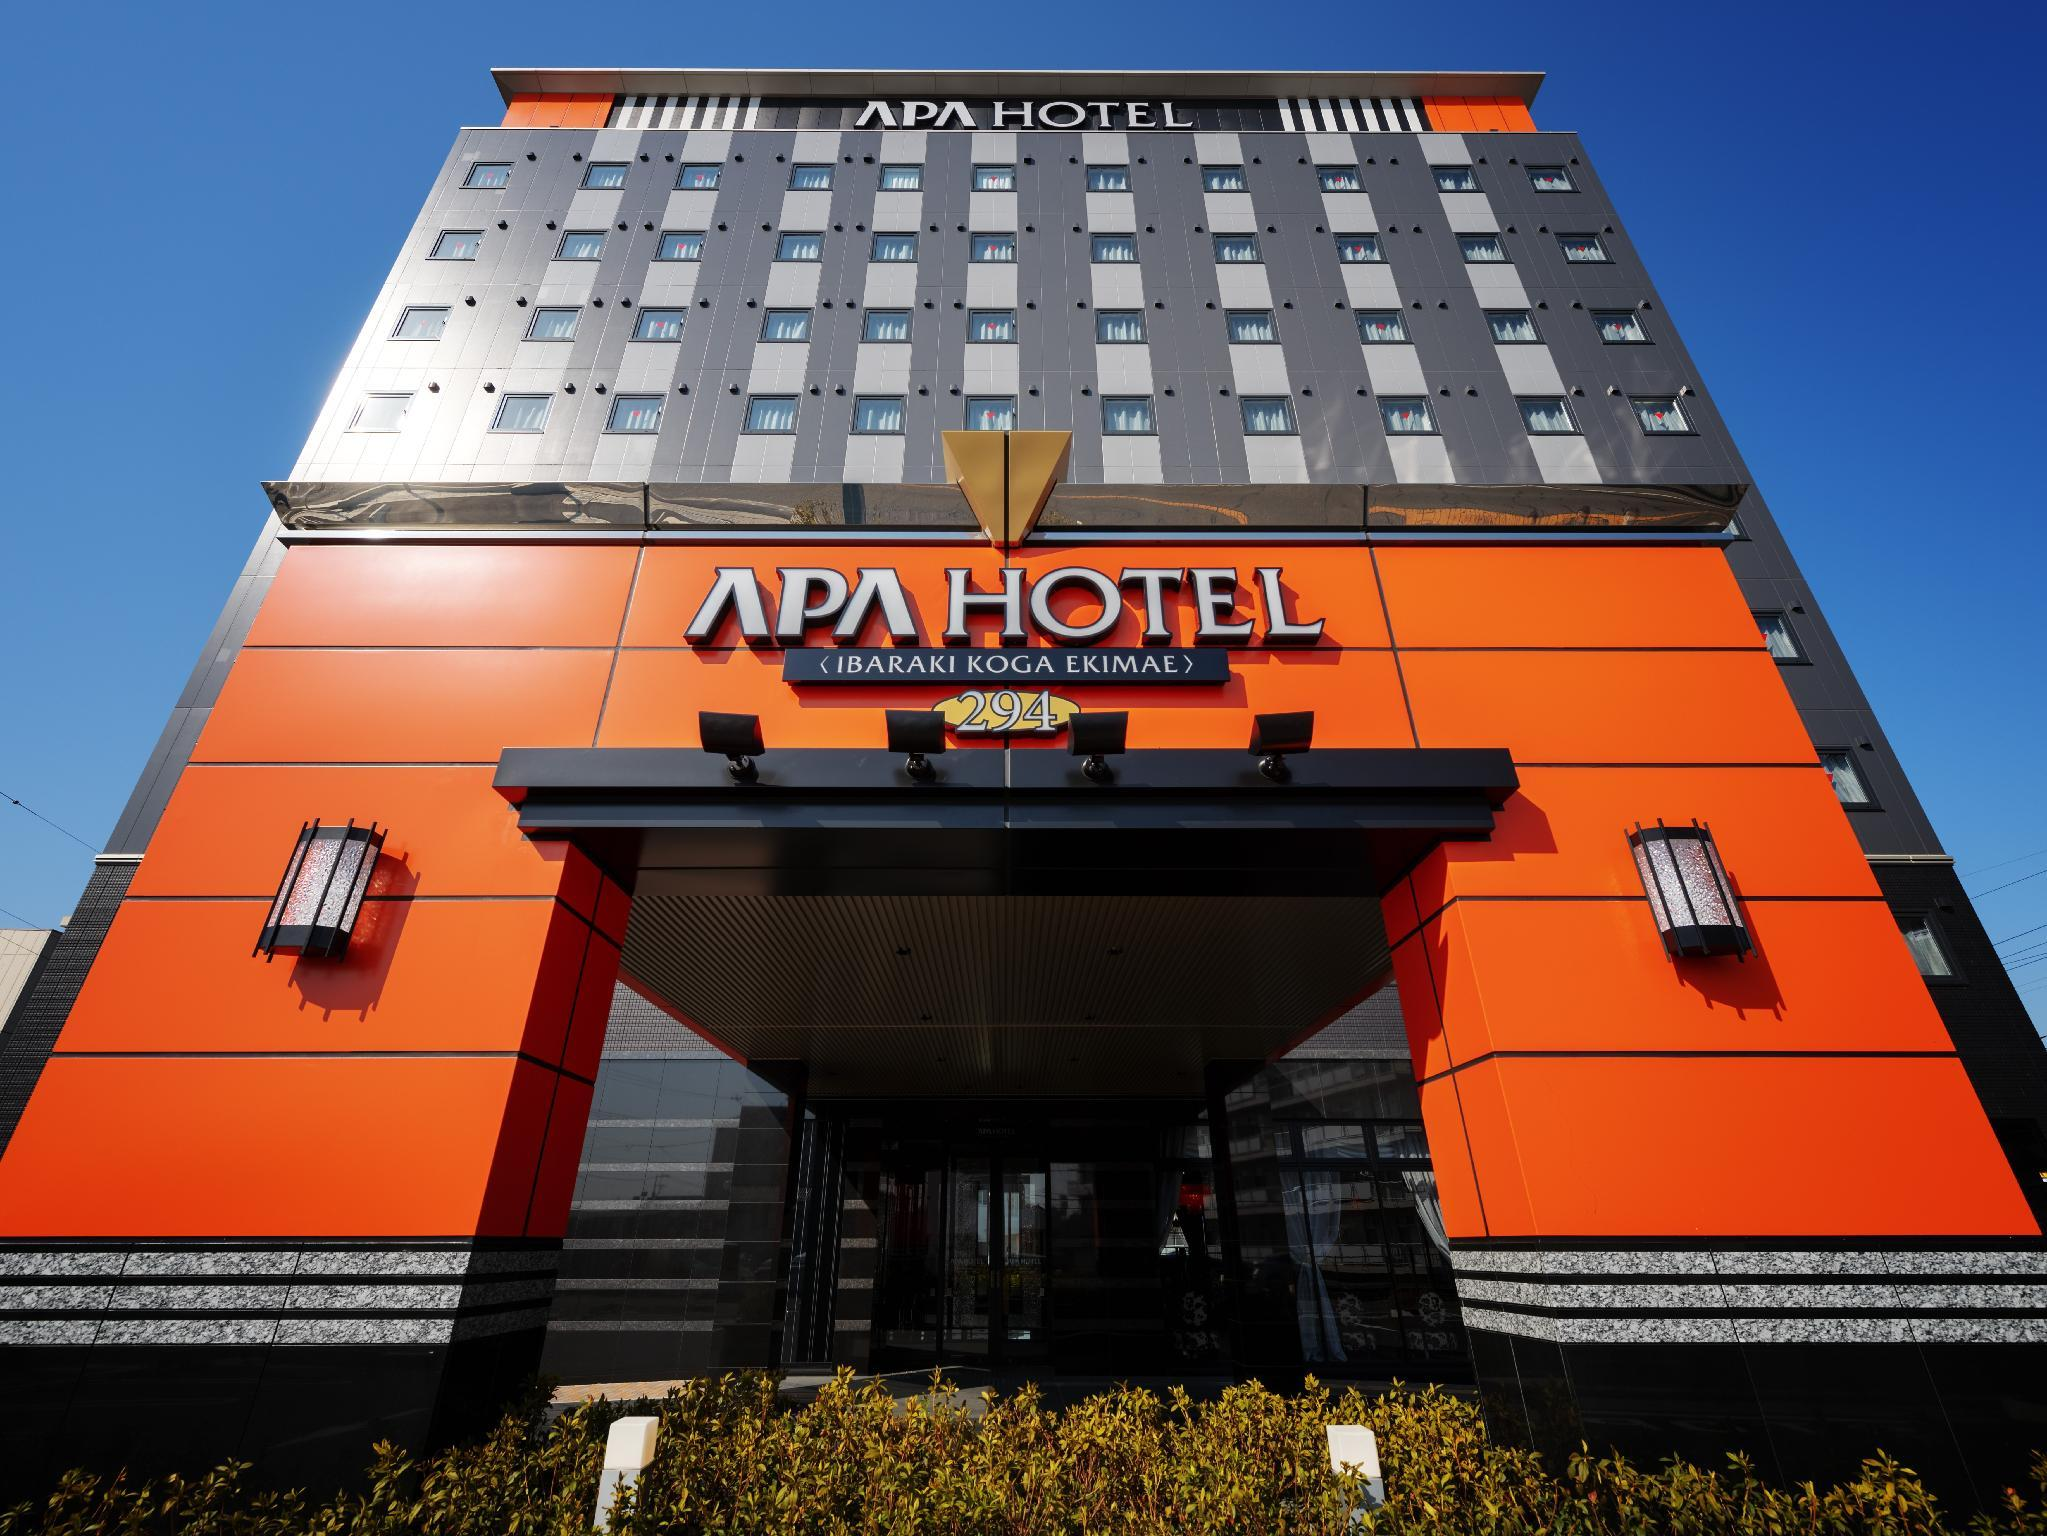 APA Hotel Ibaraki Koga Ekimae